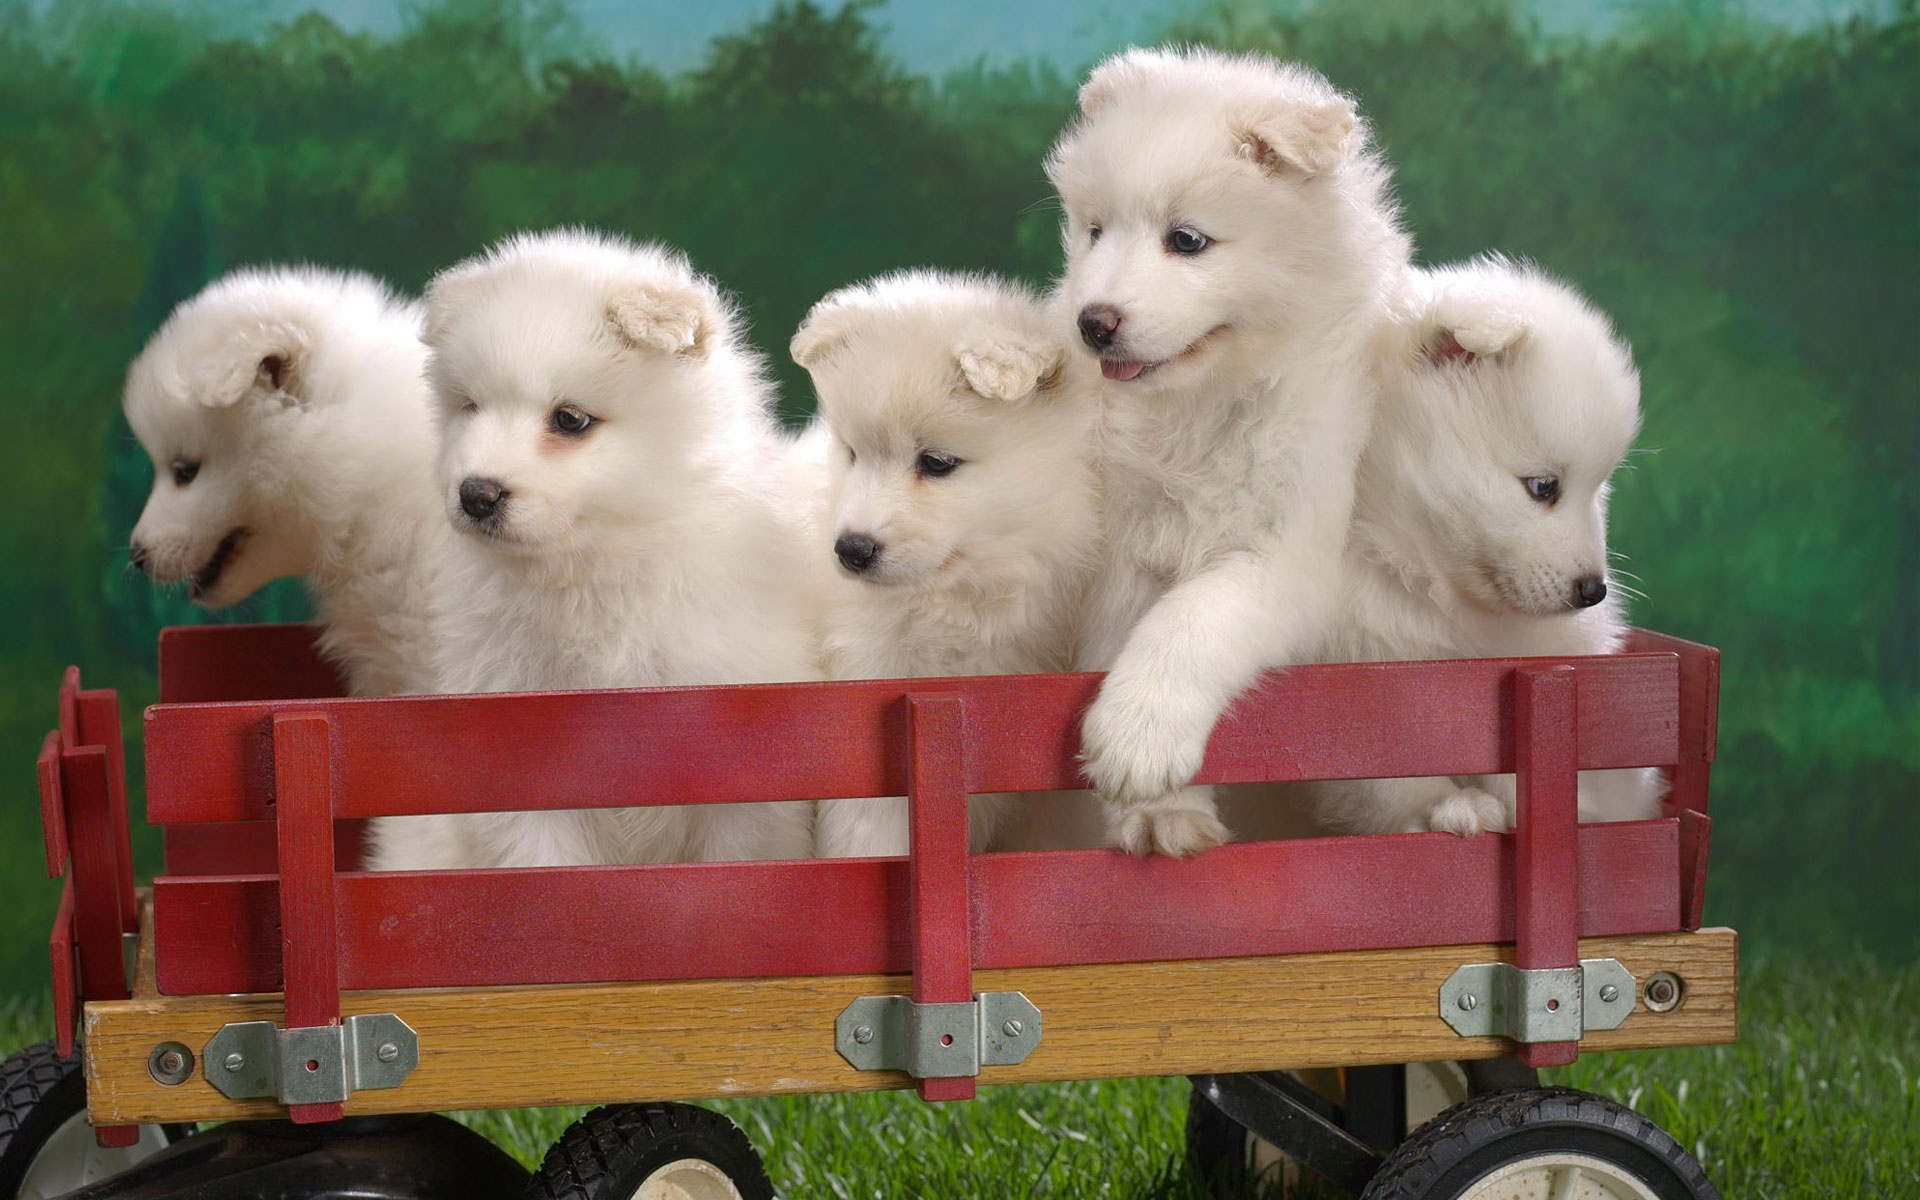 netsamoyed puppy screensaver whirlpool wagonload puppies 178789html 1920x1200